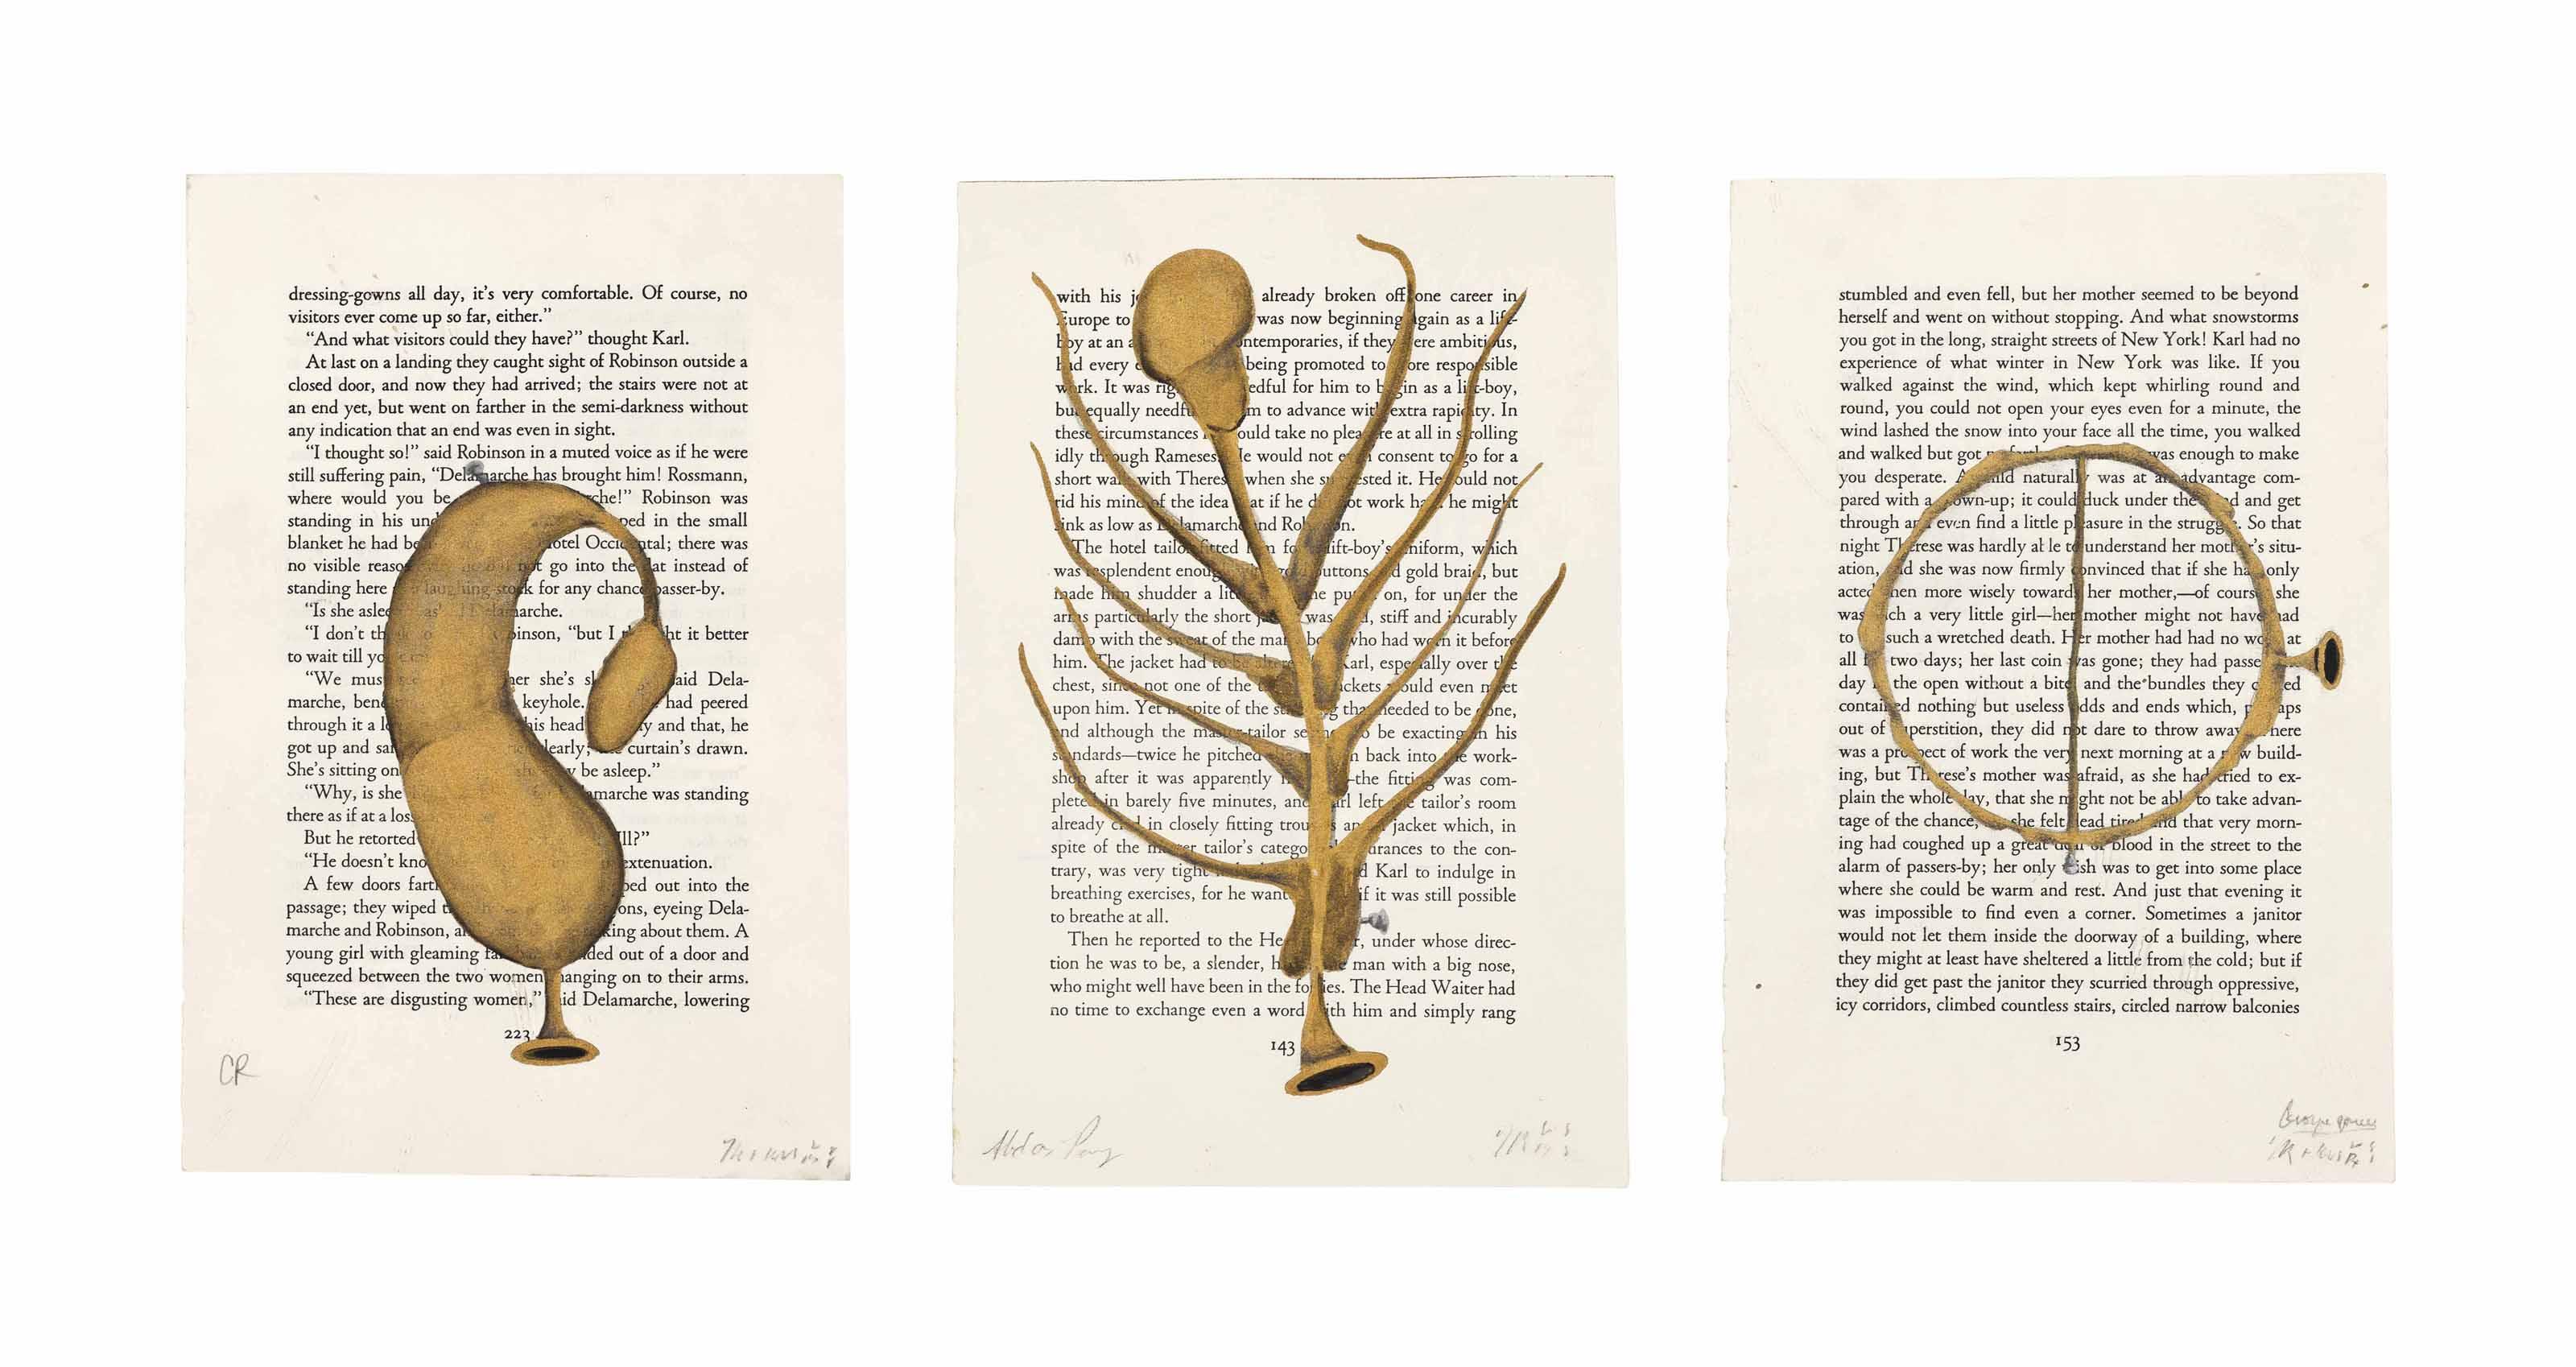 Golden Horn for Amerika series by Franz Kafka